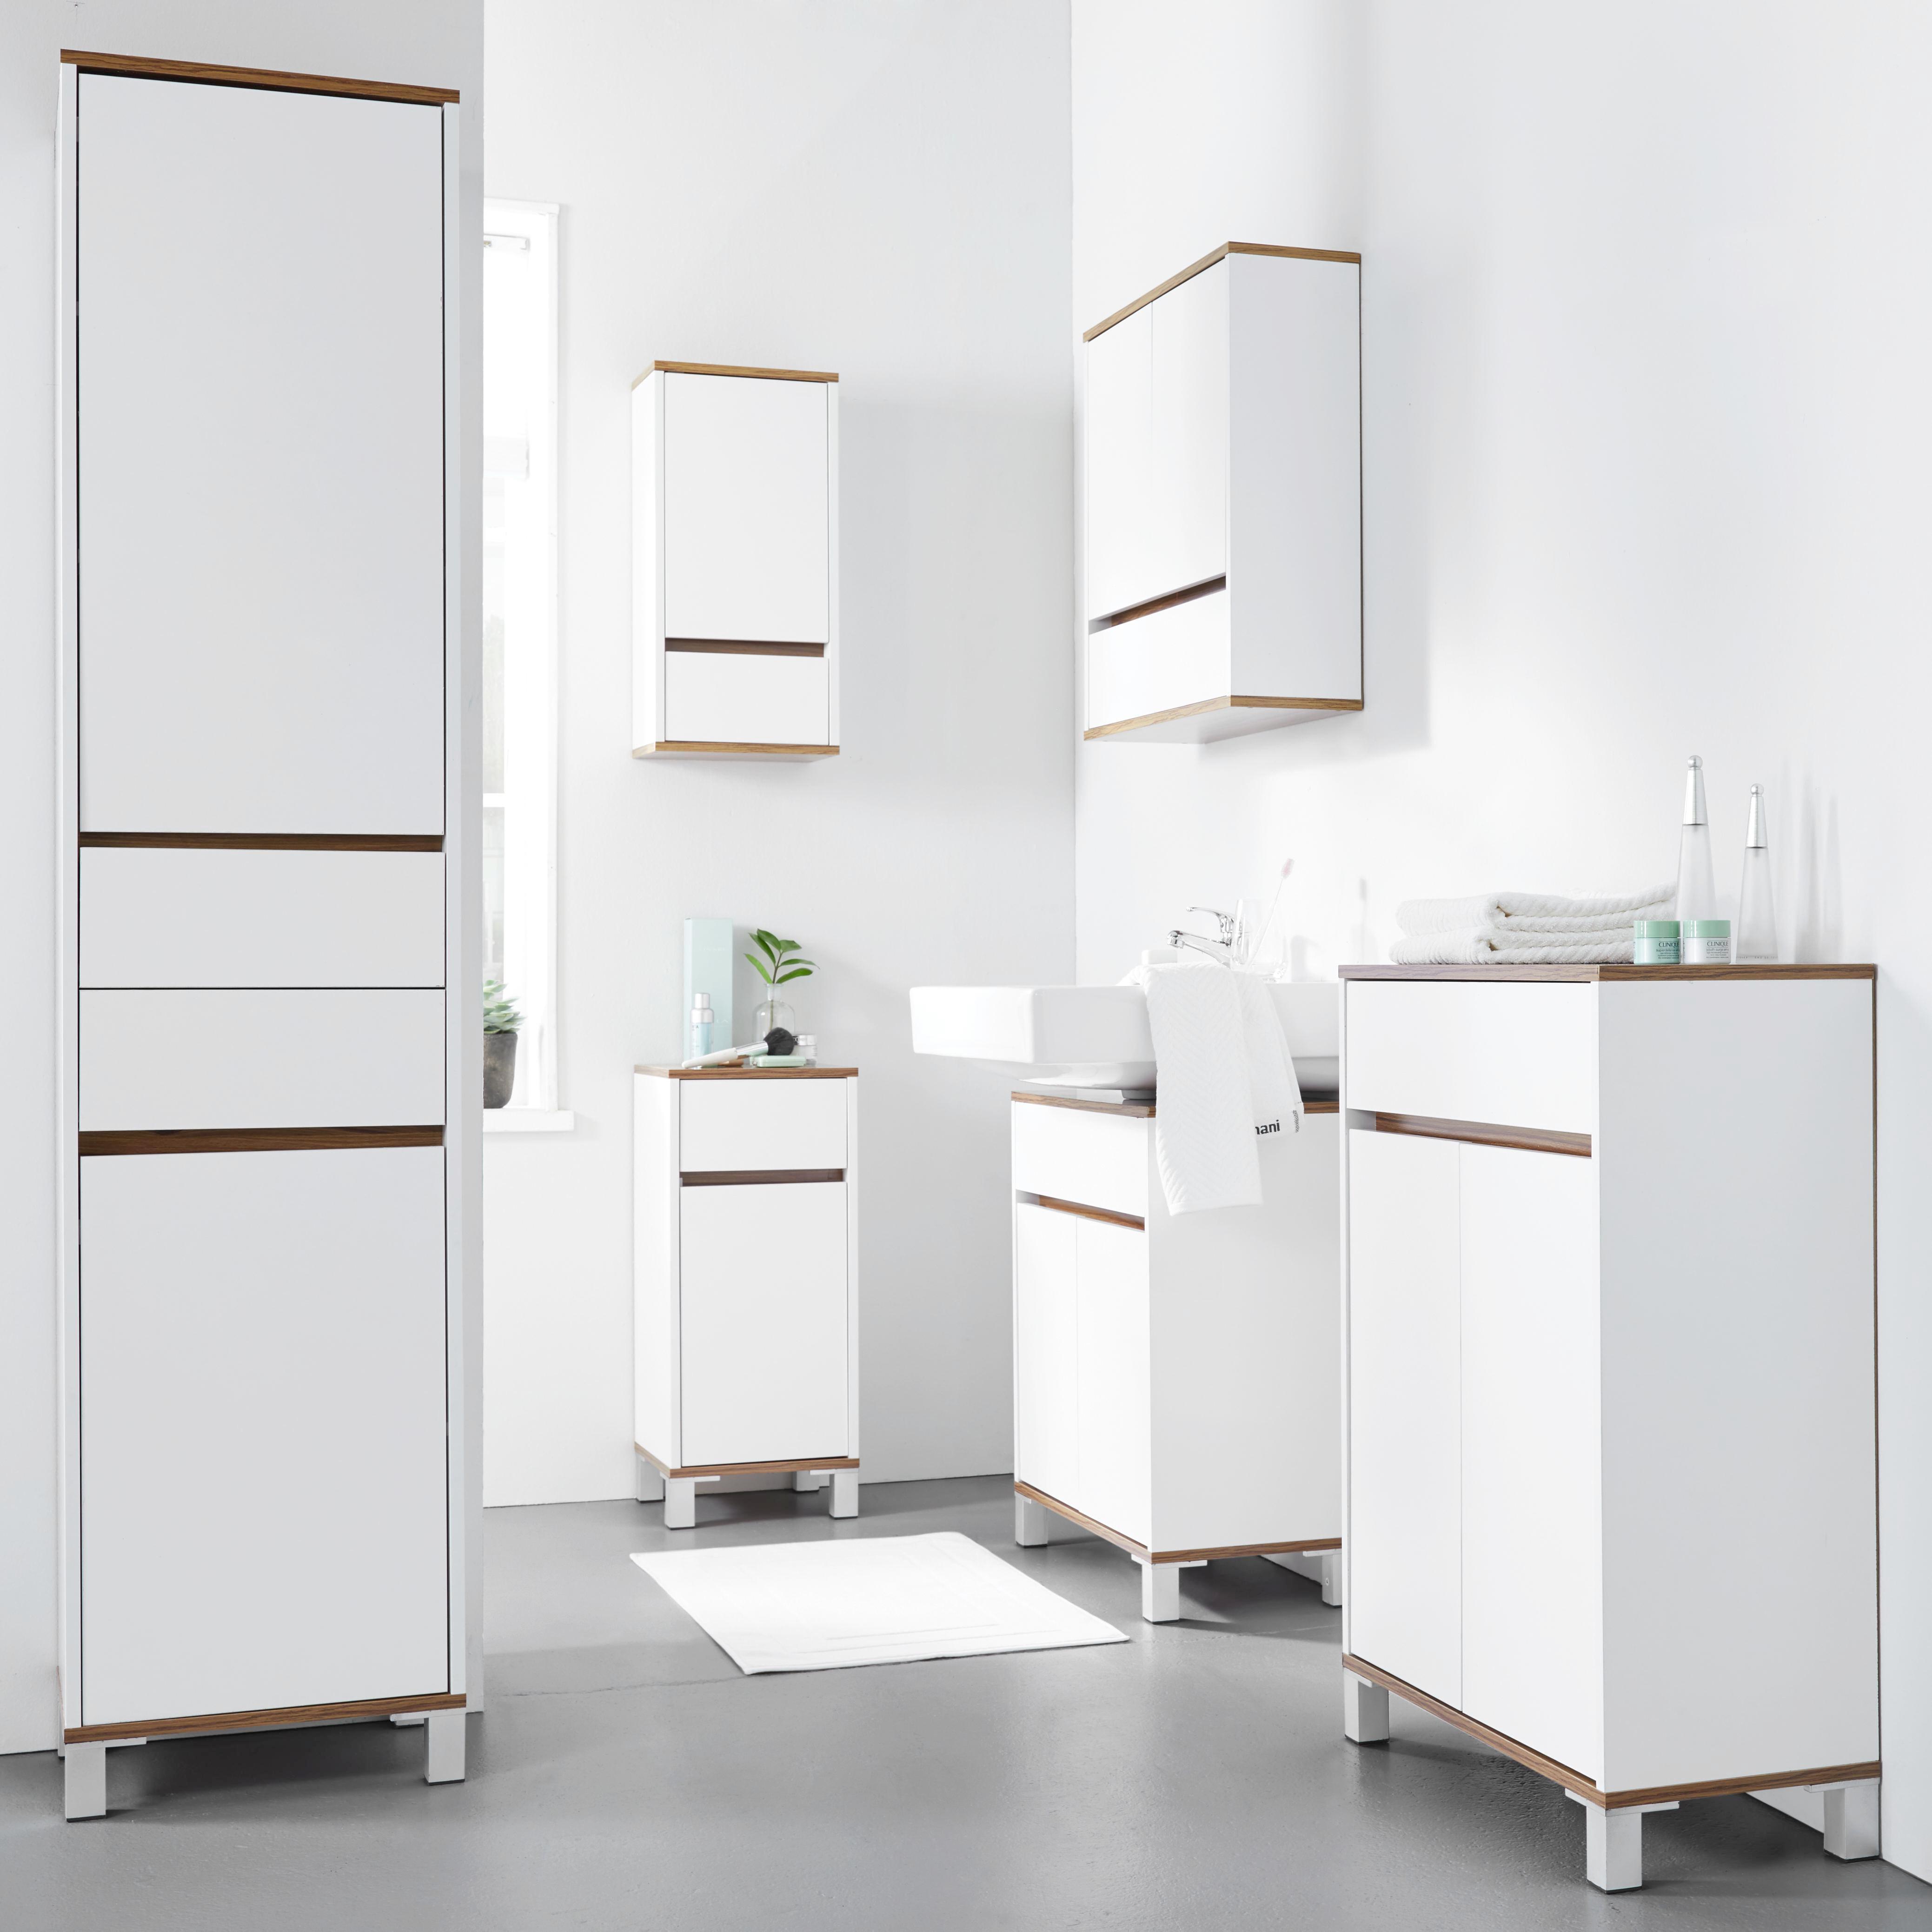 Hängeschrank Franca - Braun/Weiß, MODERN, Holz (30/62/19cm) - MÖMAX modern living